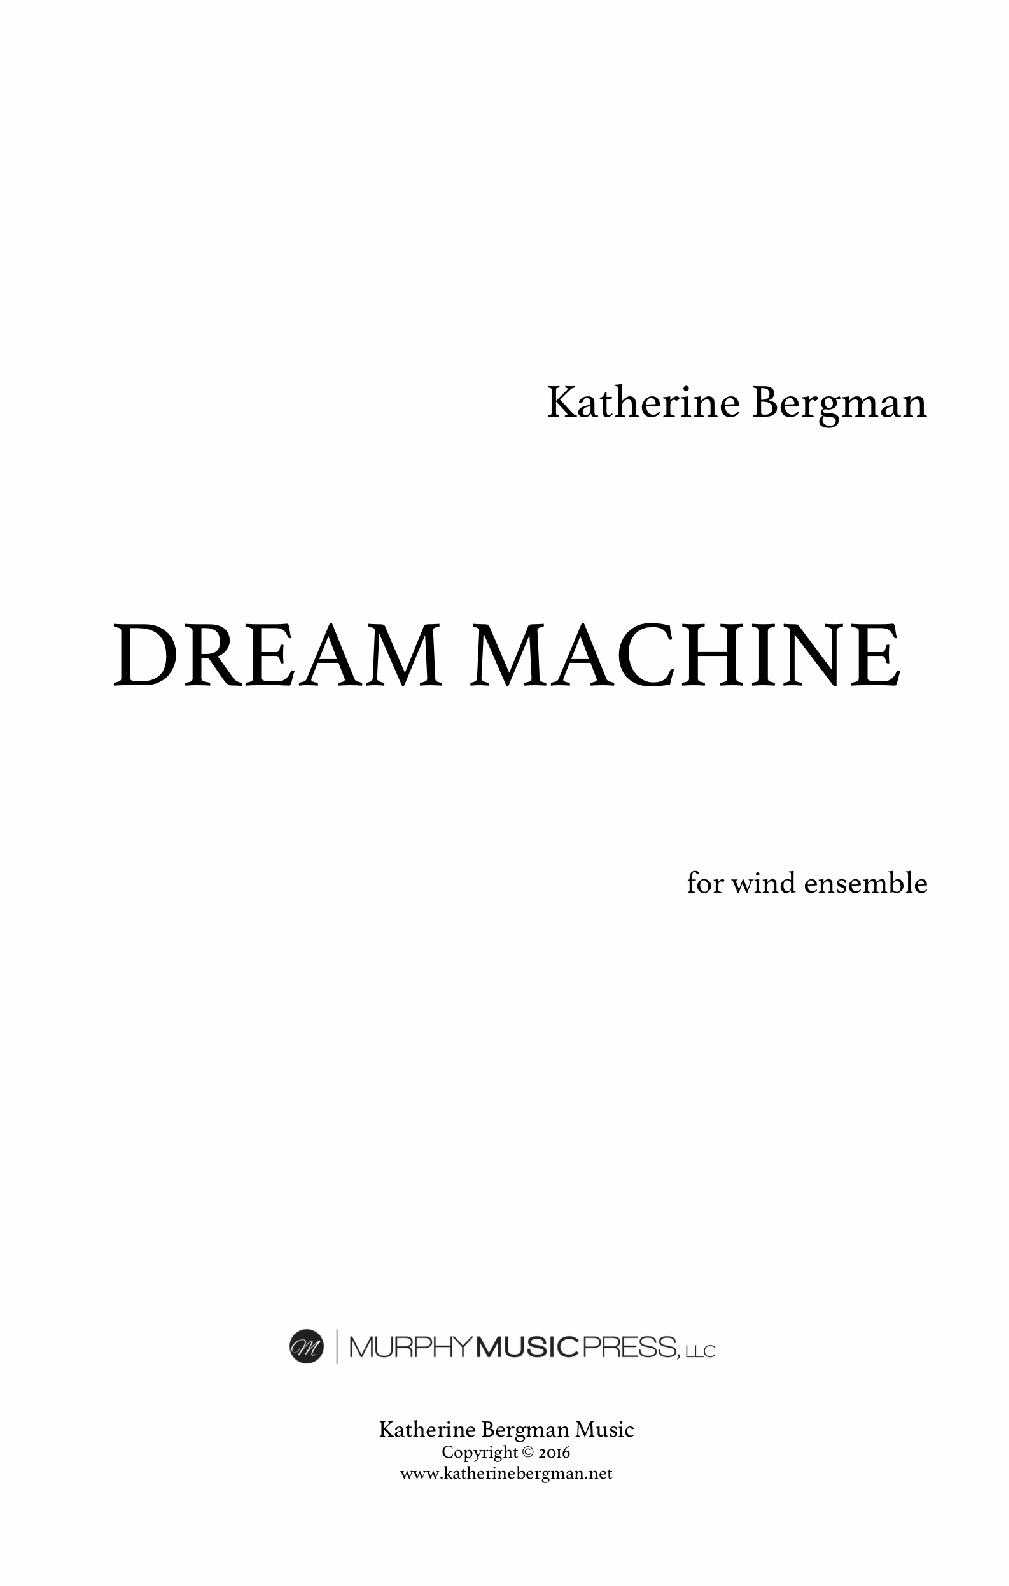 Dream Machine by Katherine Bergman